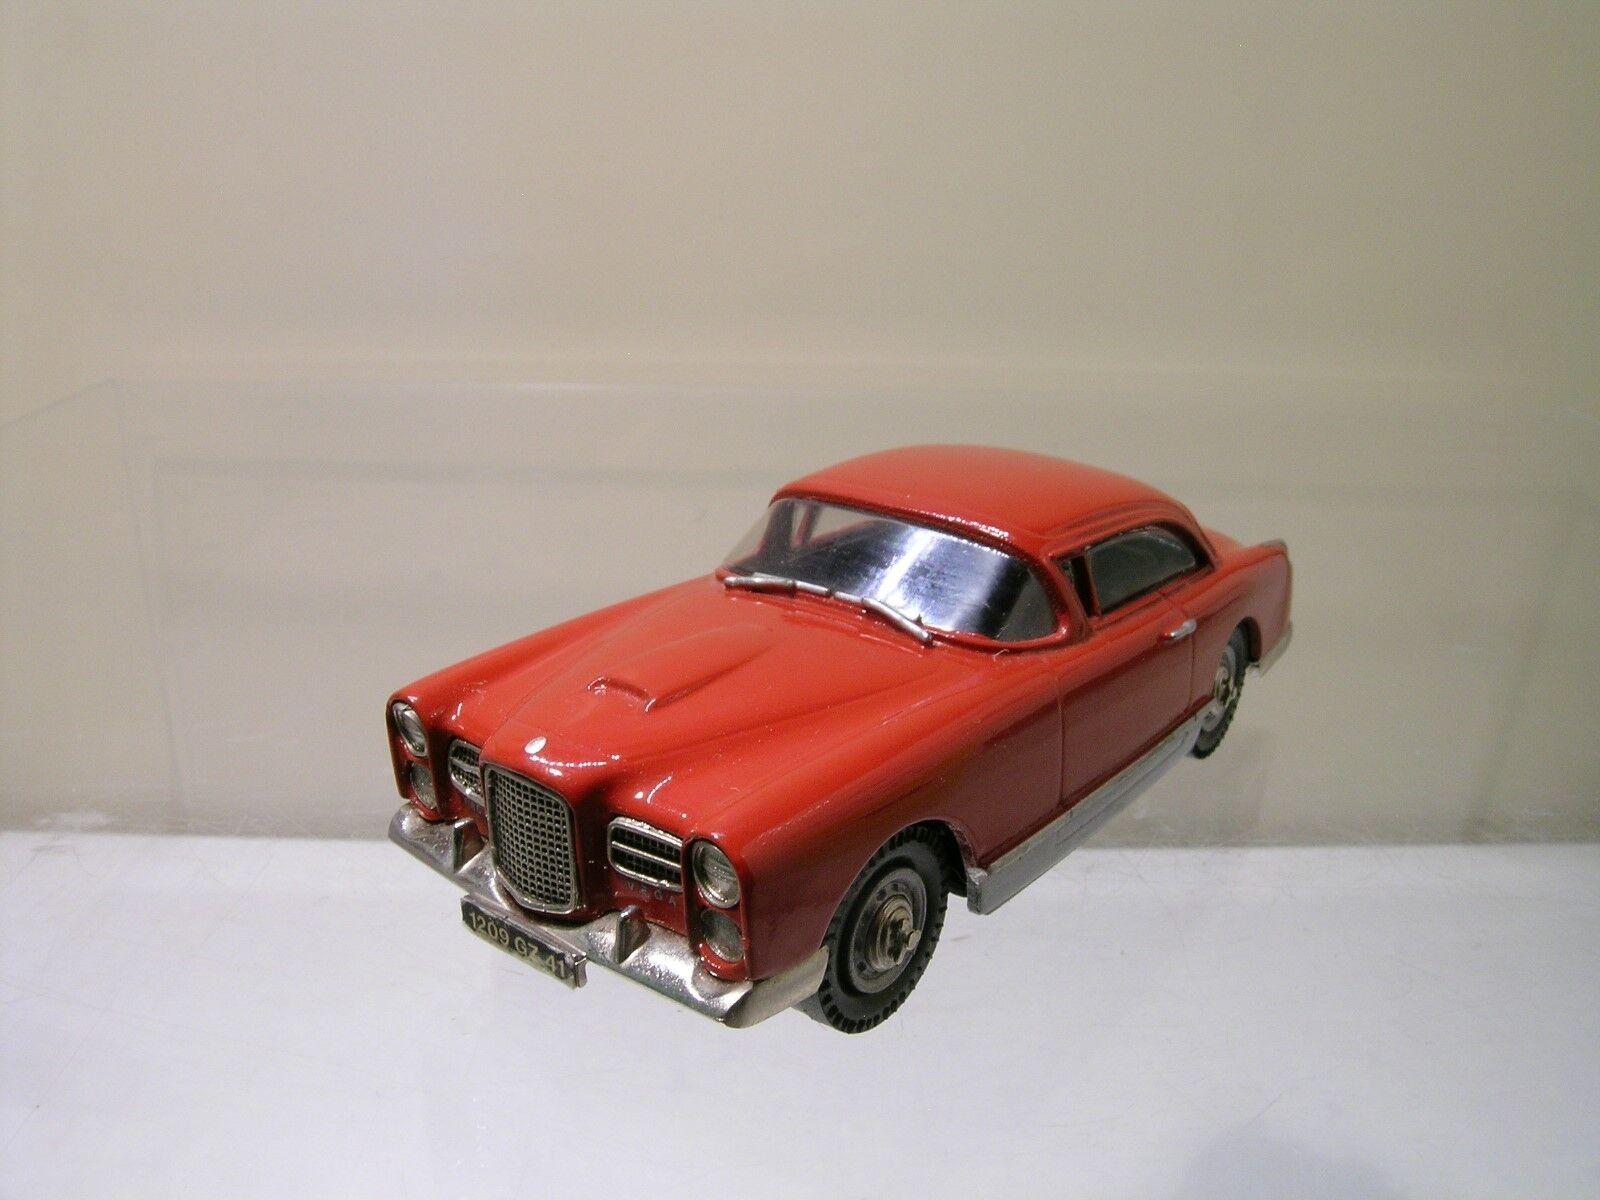 PATHFINDER PFMCC01 FACEL VEGA HK500 1960 rosso bianca -METAL HANDBUILT SCALE 1:43